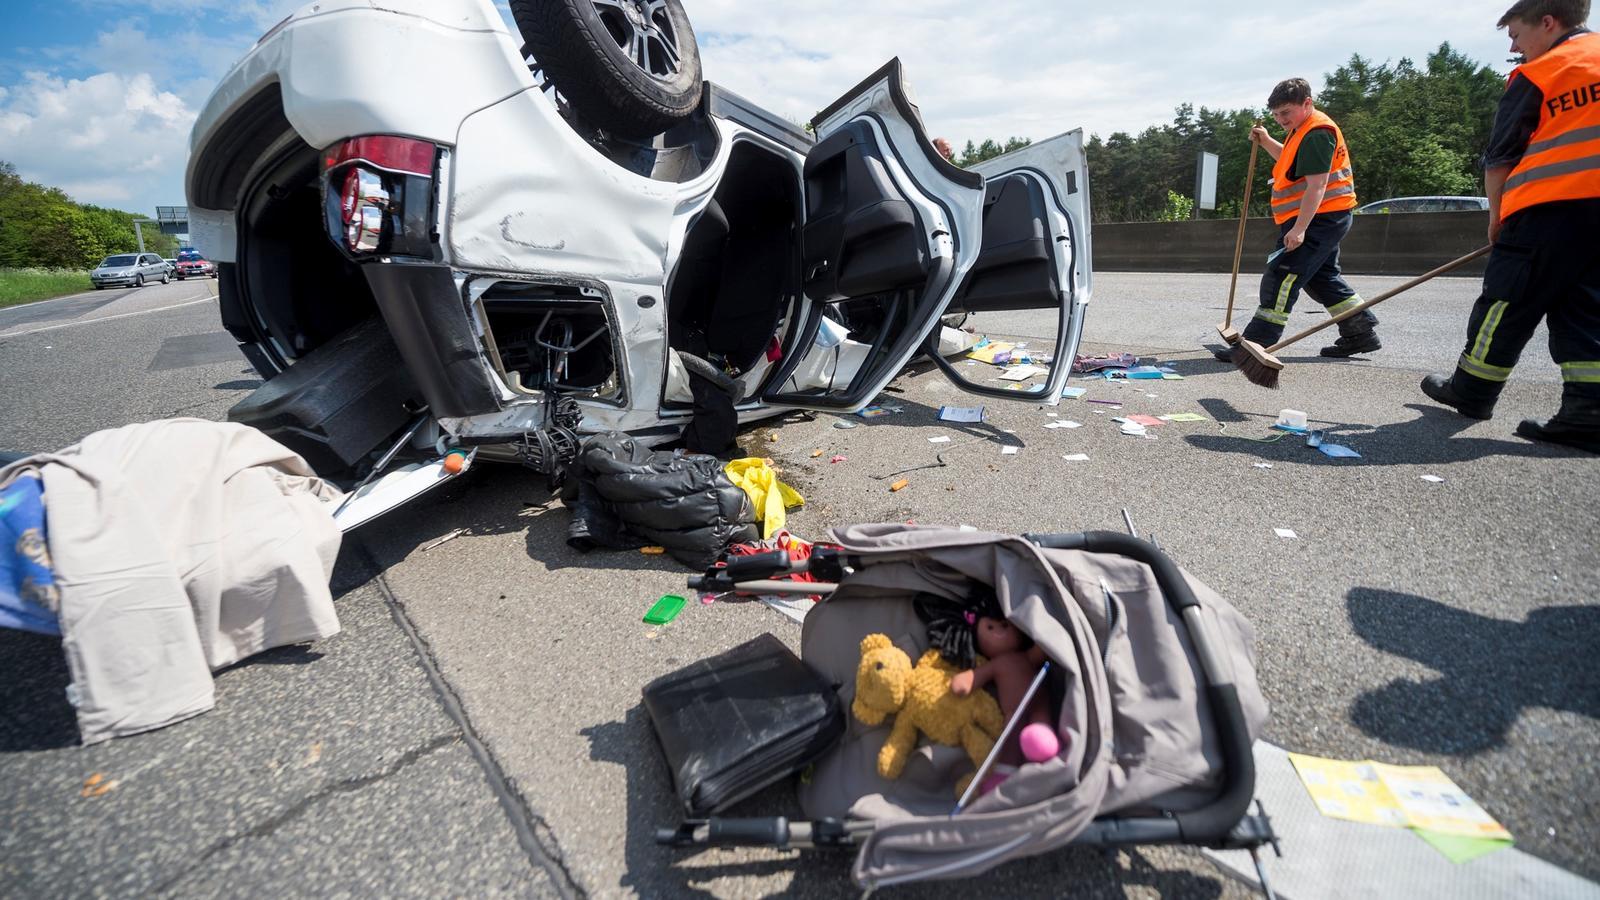 Schwerer Unfall auf der A5 bei Friedberg (Foto: Sven-Sebastian Sajak)